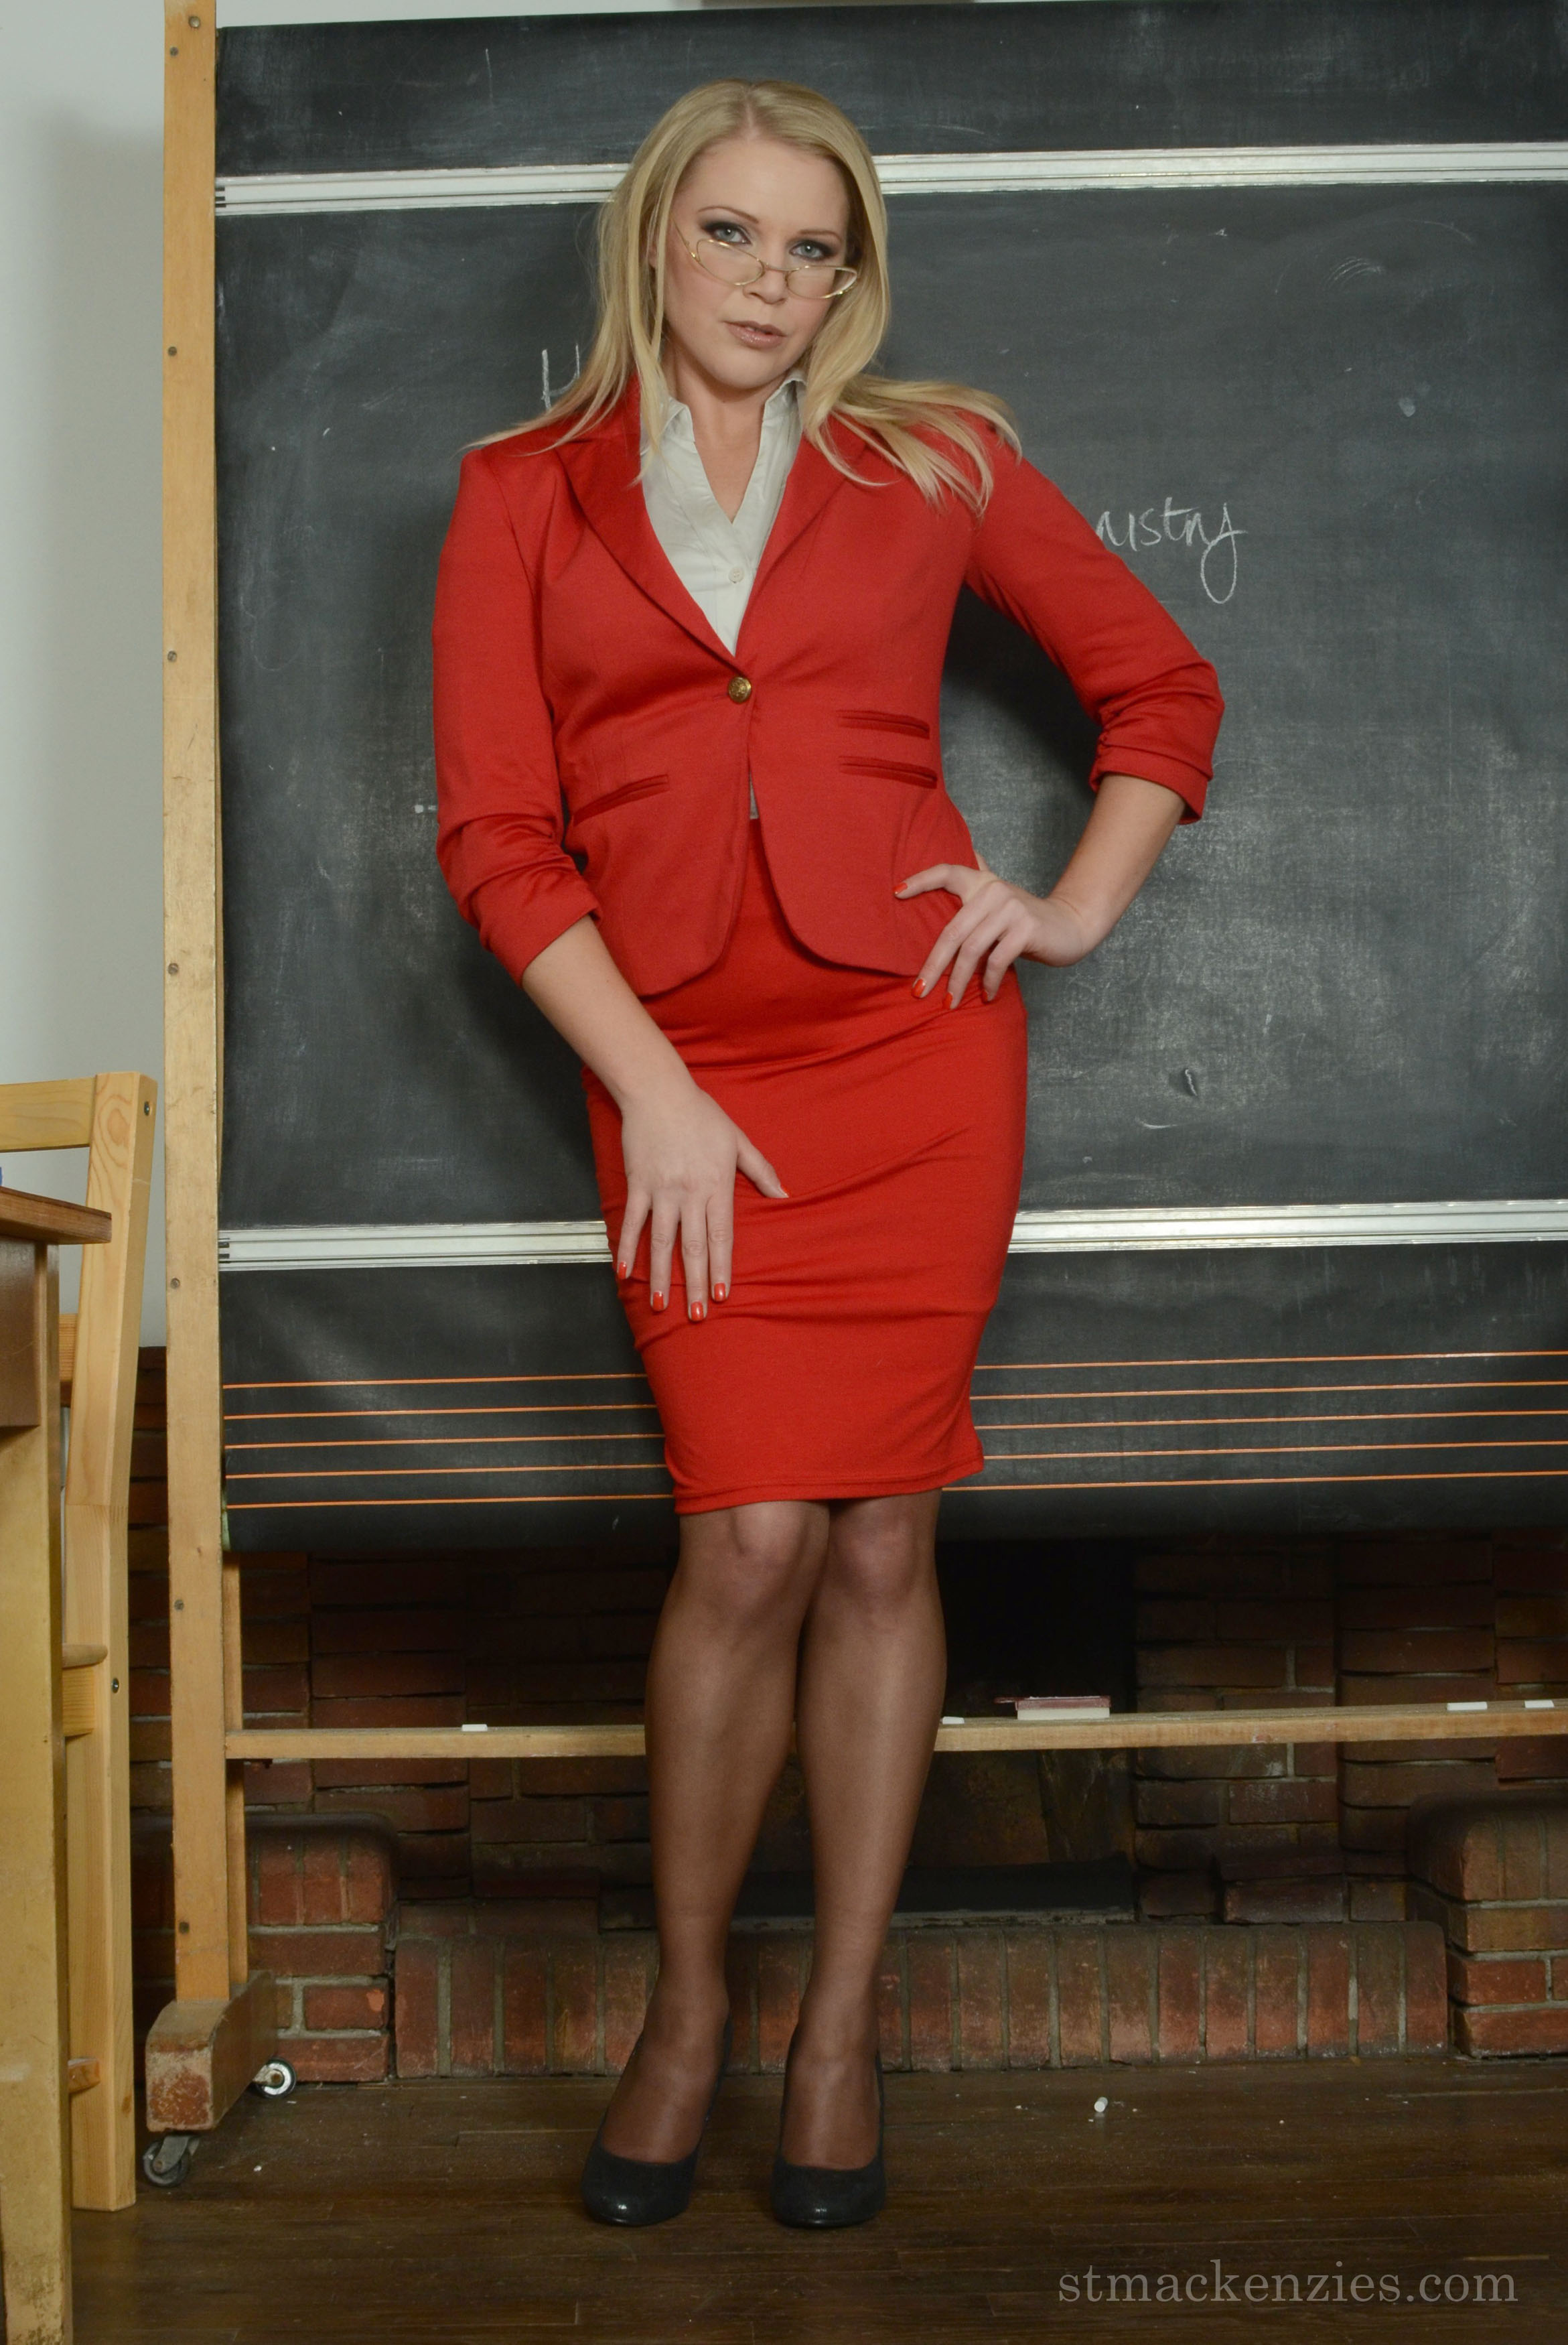 Miss Toyne, a teacher at St Mackenzies